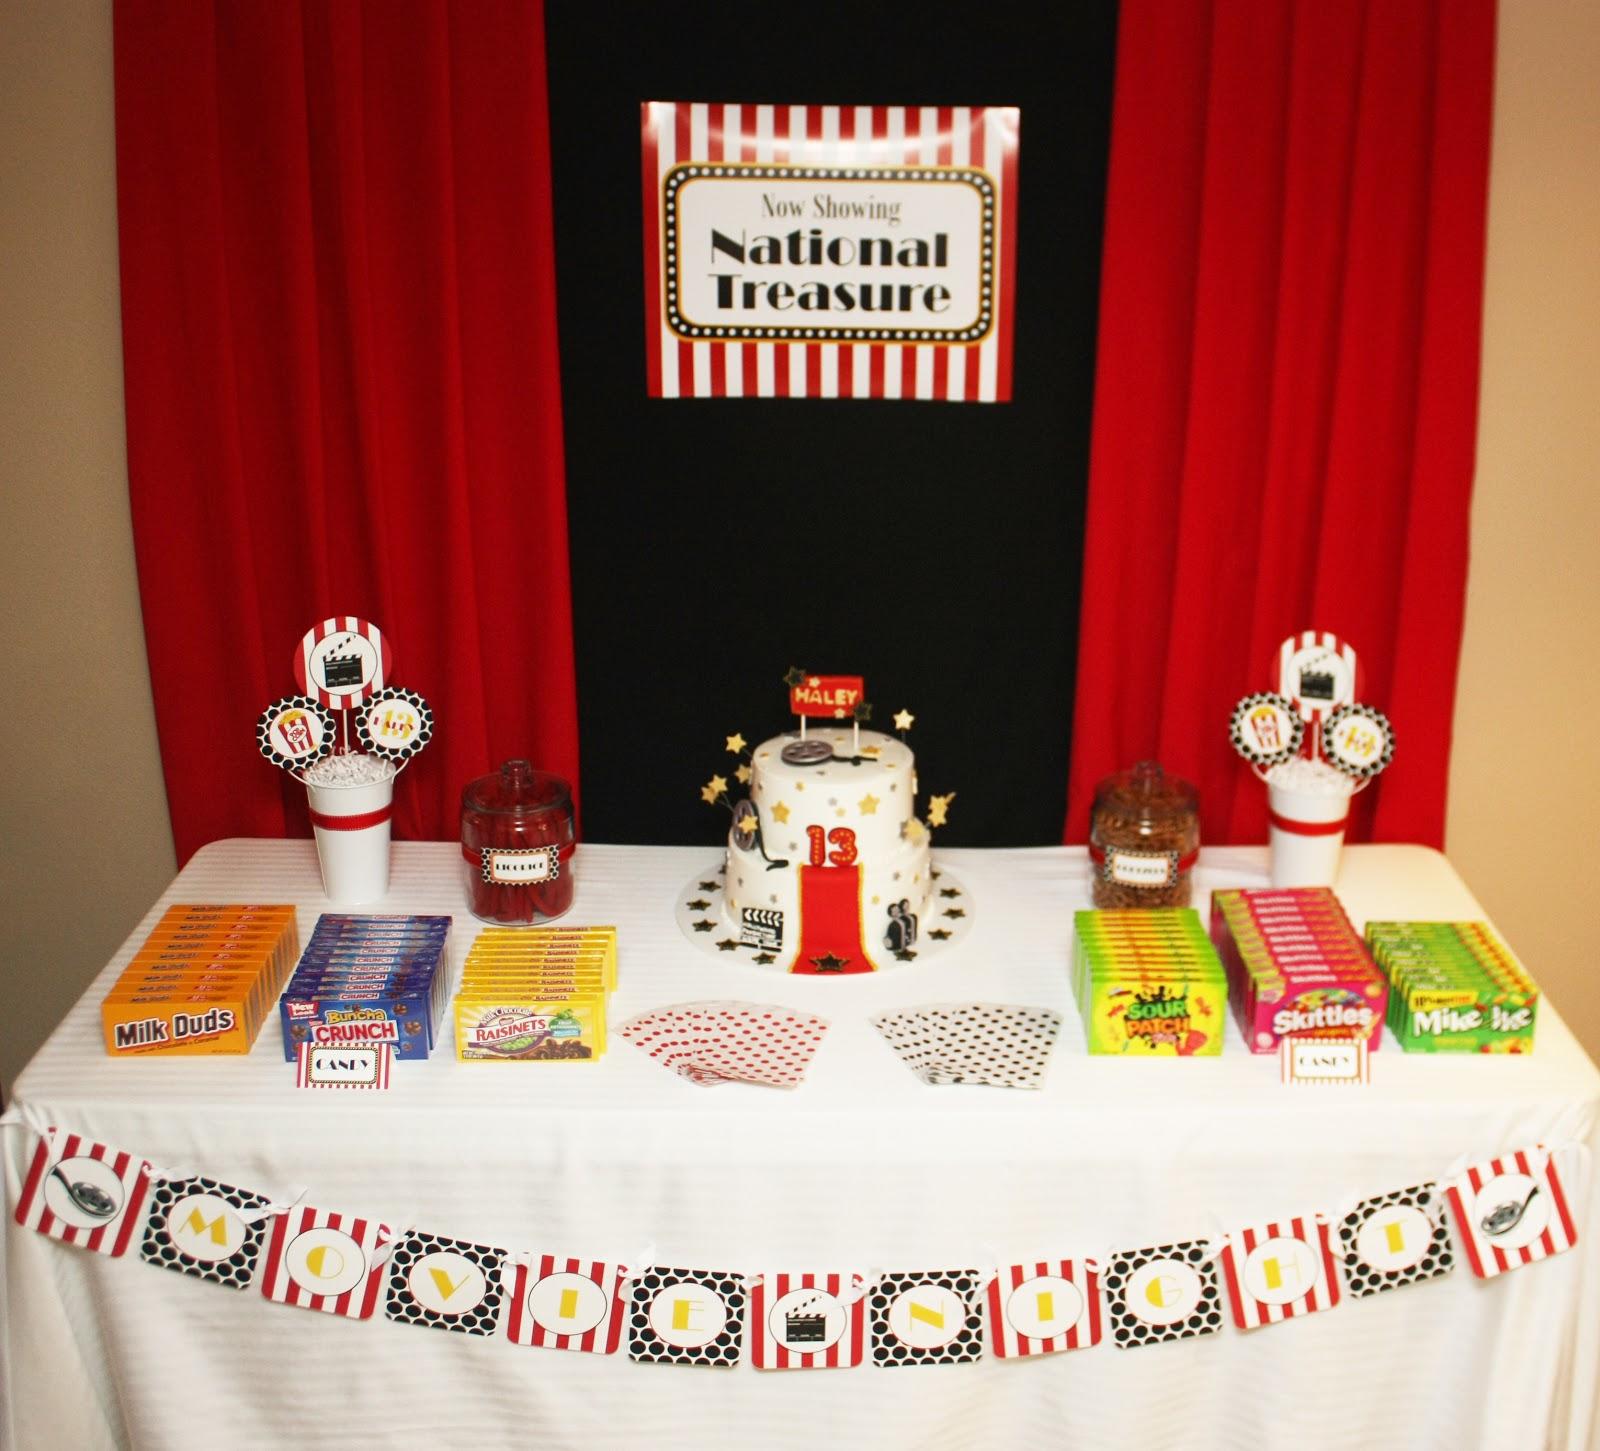 5M Creations: Movie Night 13th Birthday Party